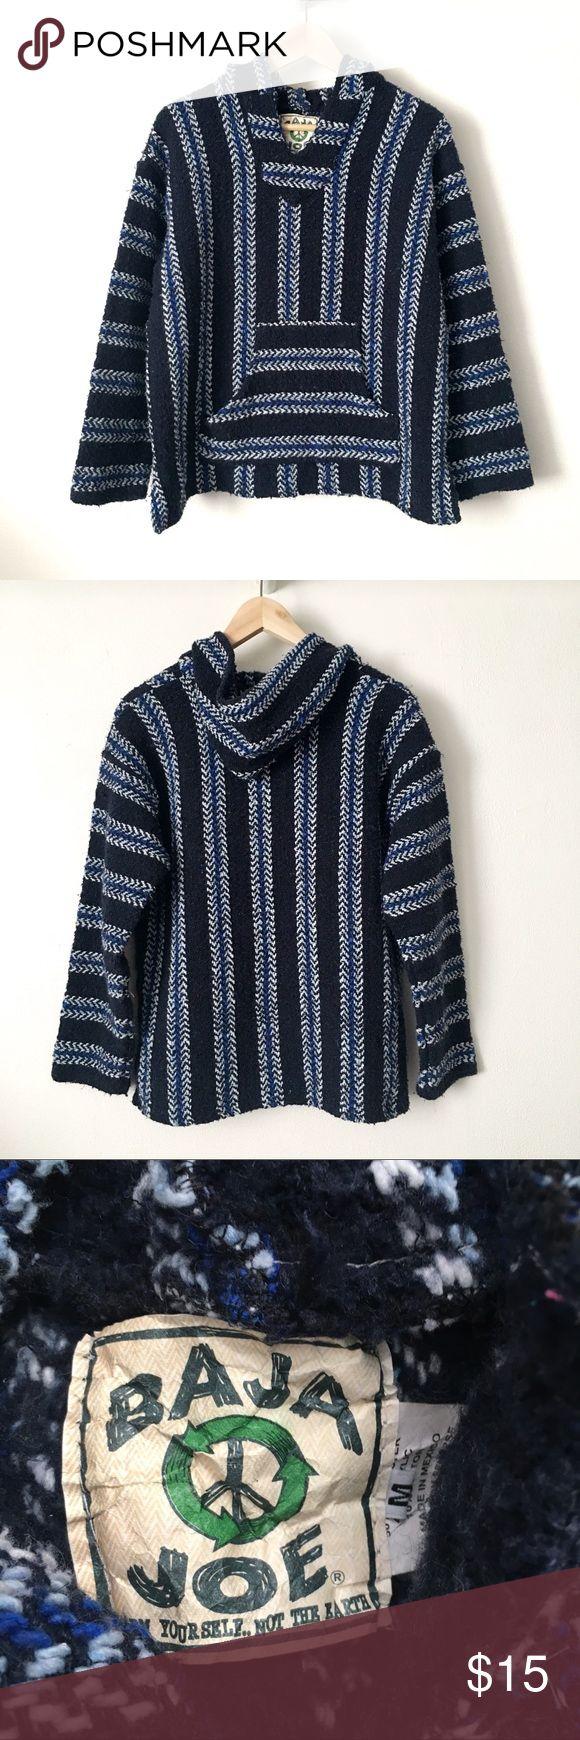 🆕 Listing!  Baja Joe   Hoodie Navy, blue, and white striped environmentally friendly hoodie.  This is marked a M.  Fits like a Women's M, mens S. Baja Joe Sweaters